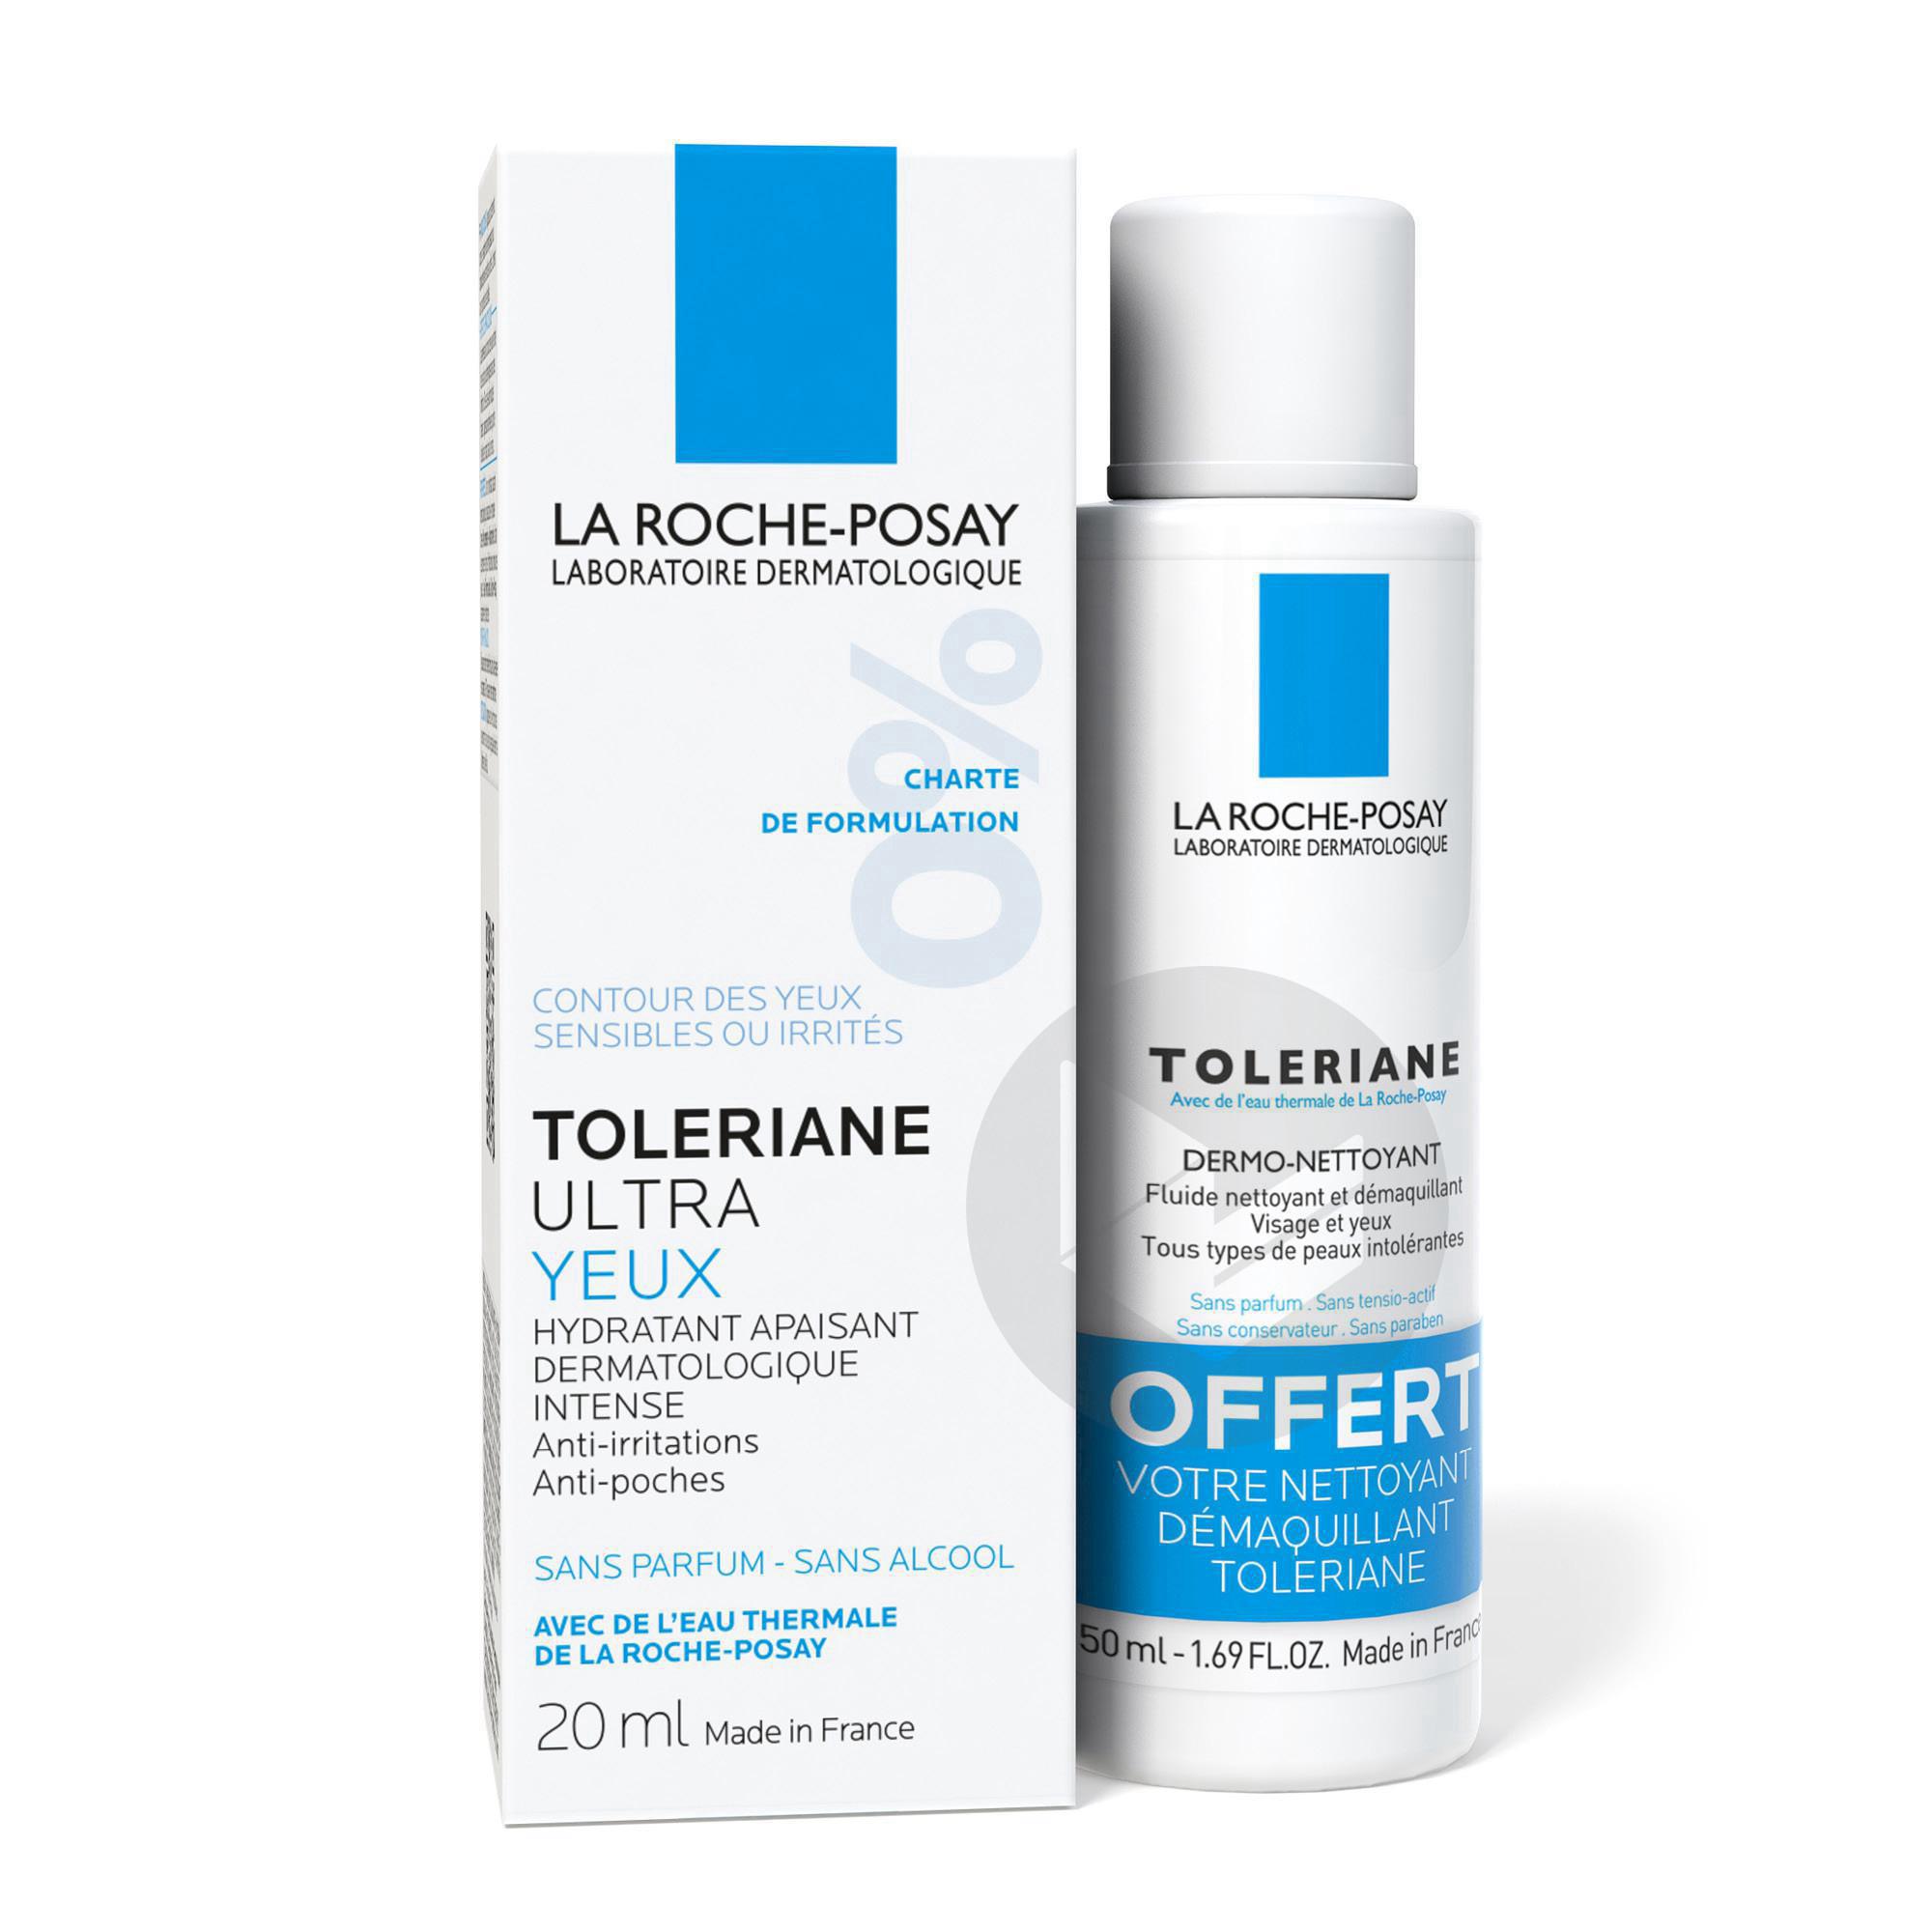 Toleriane Ultra Contour yeux hydratant apaisant intense + Nettoyant démaquillant offert